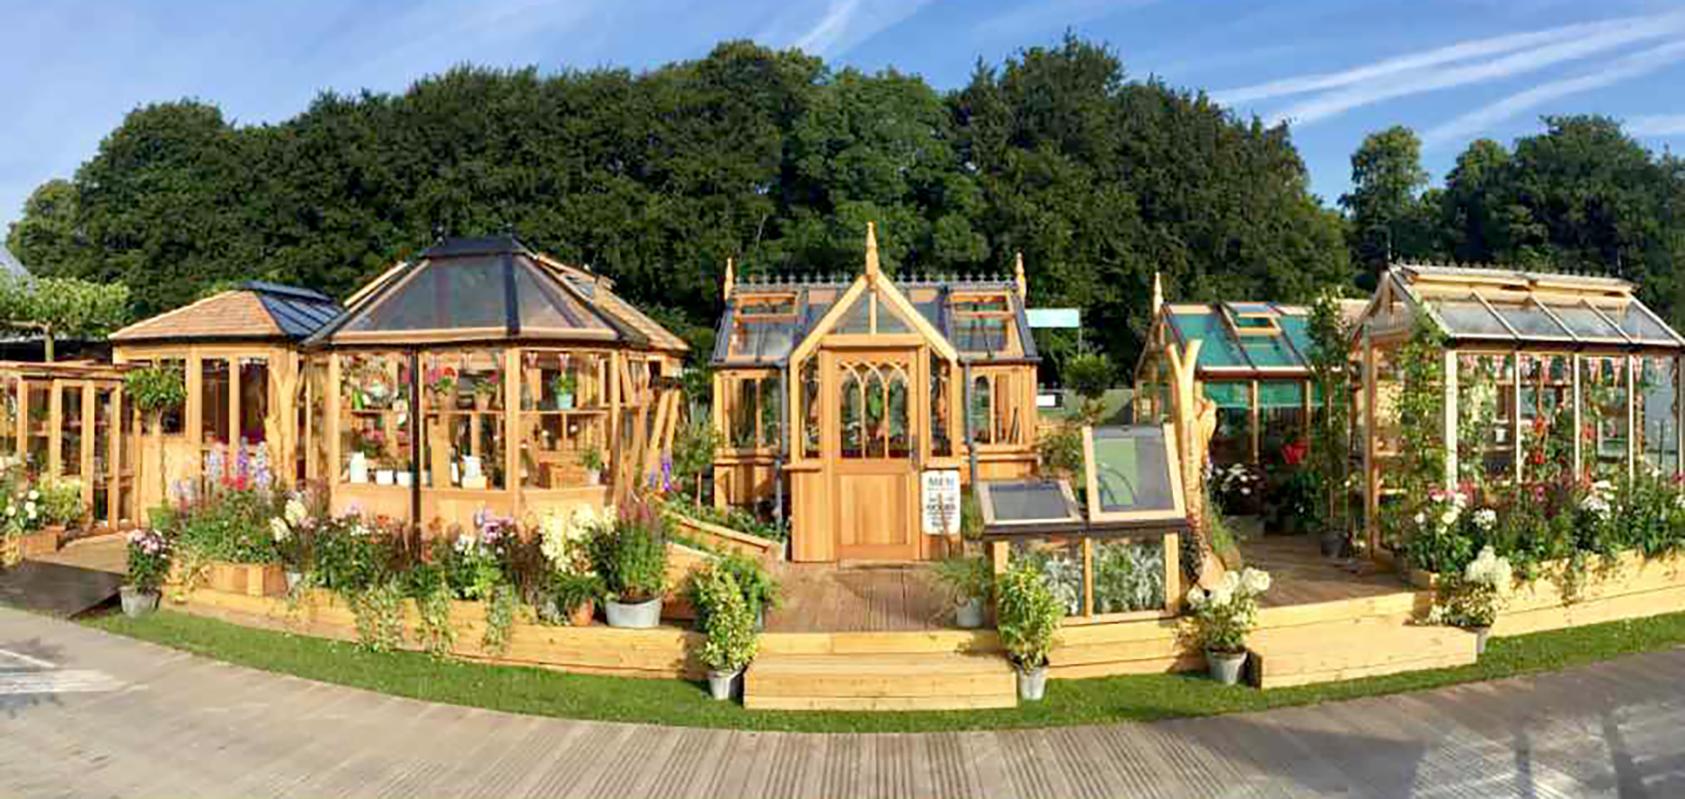 Cedargreenhouses